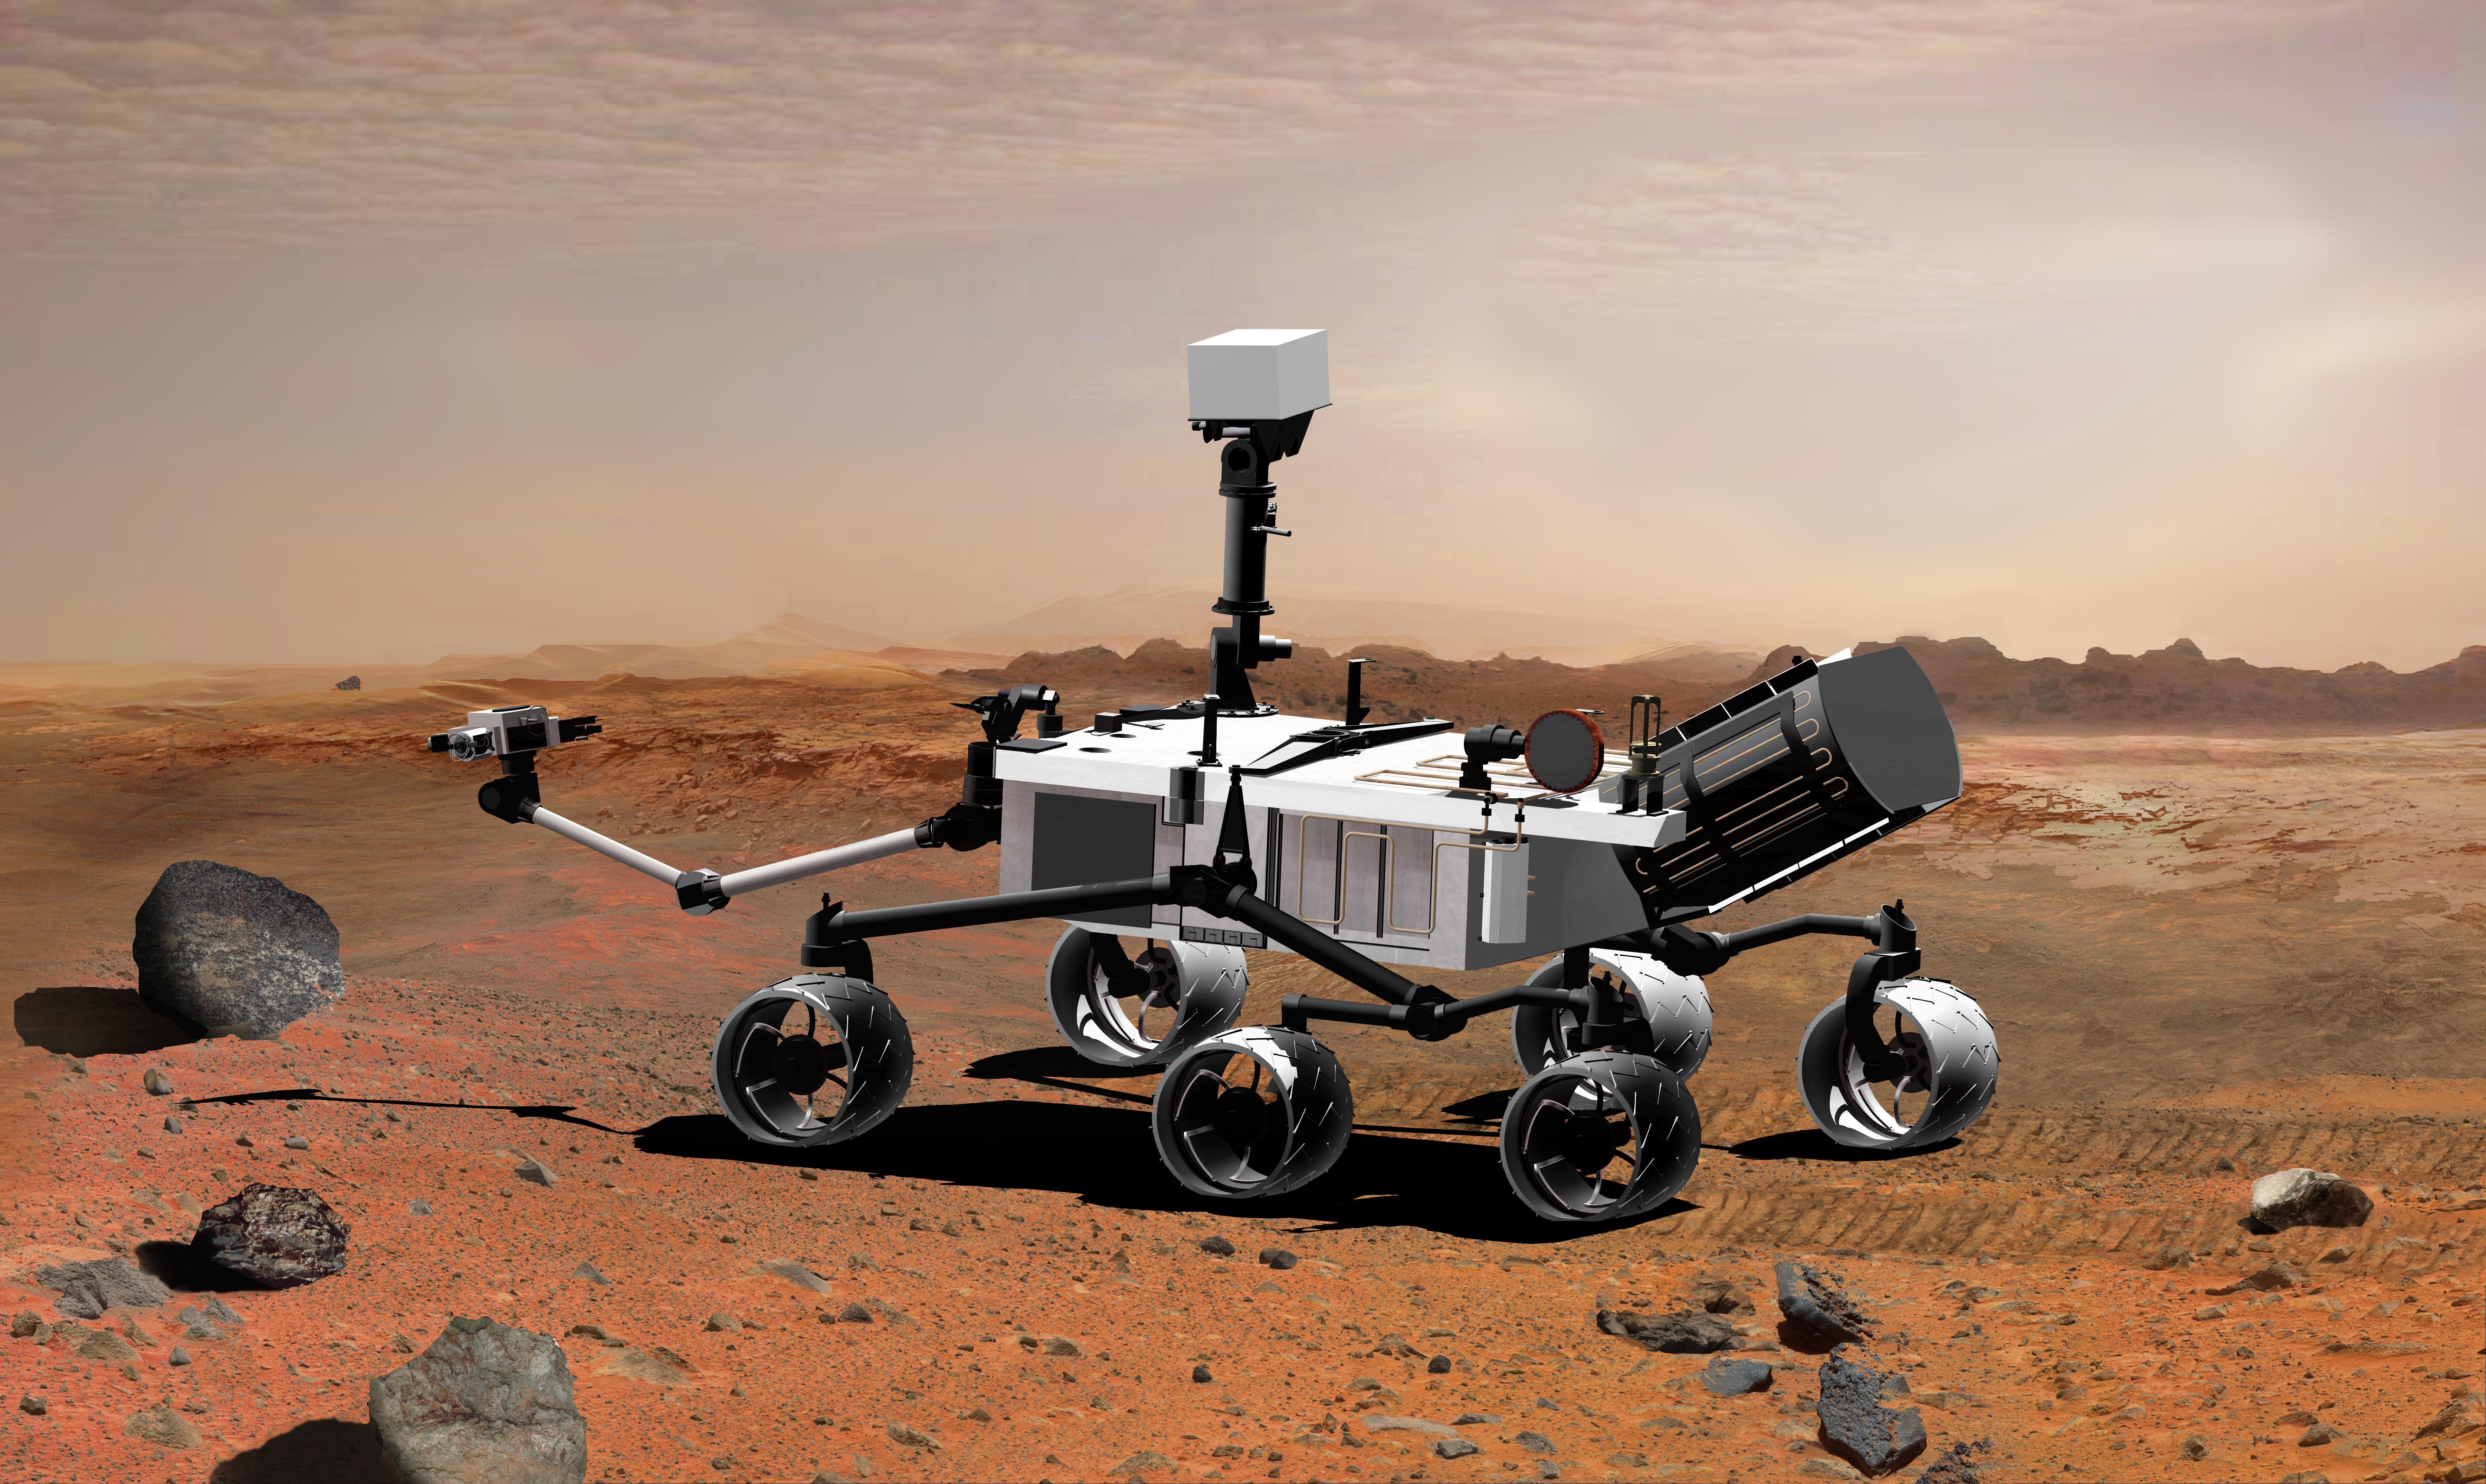 Rover Has 6-Wheel Drive